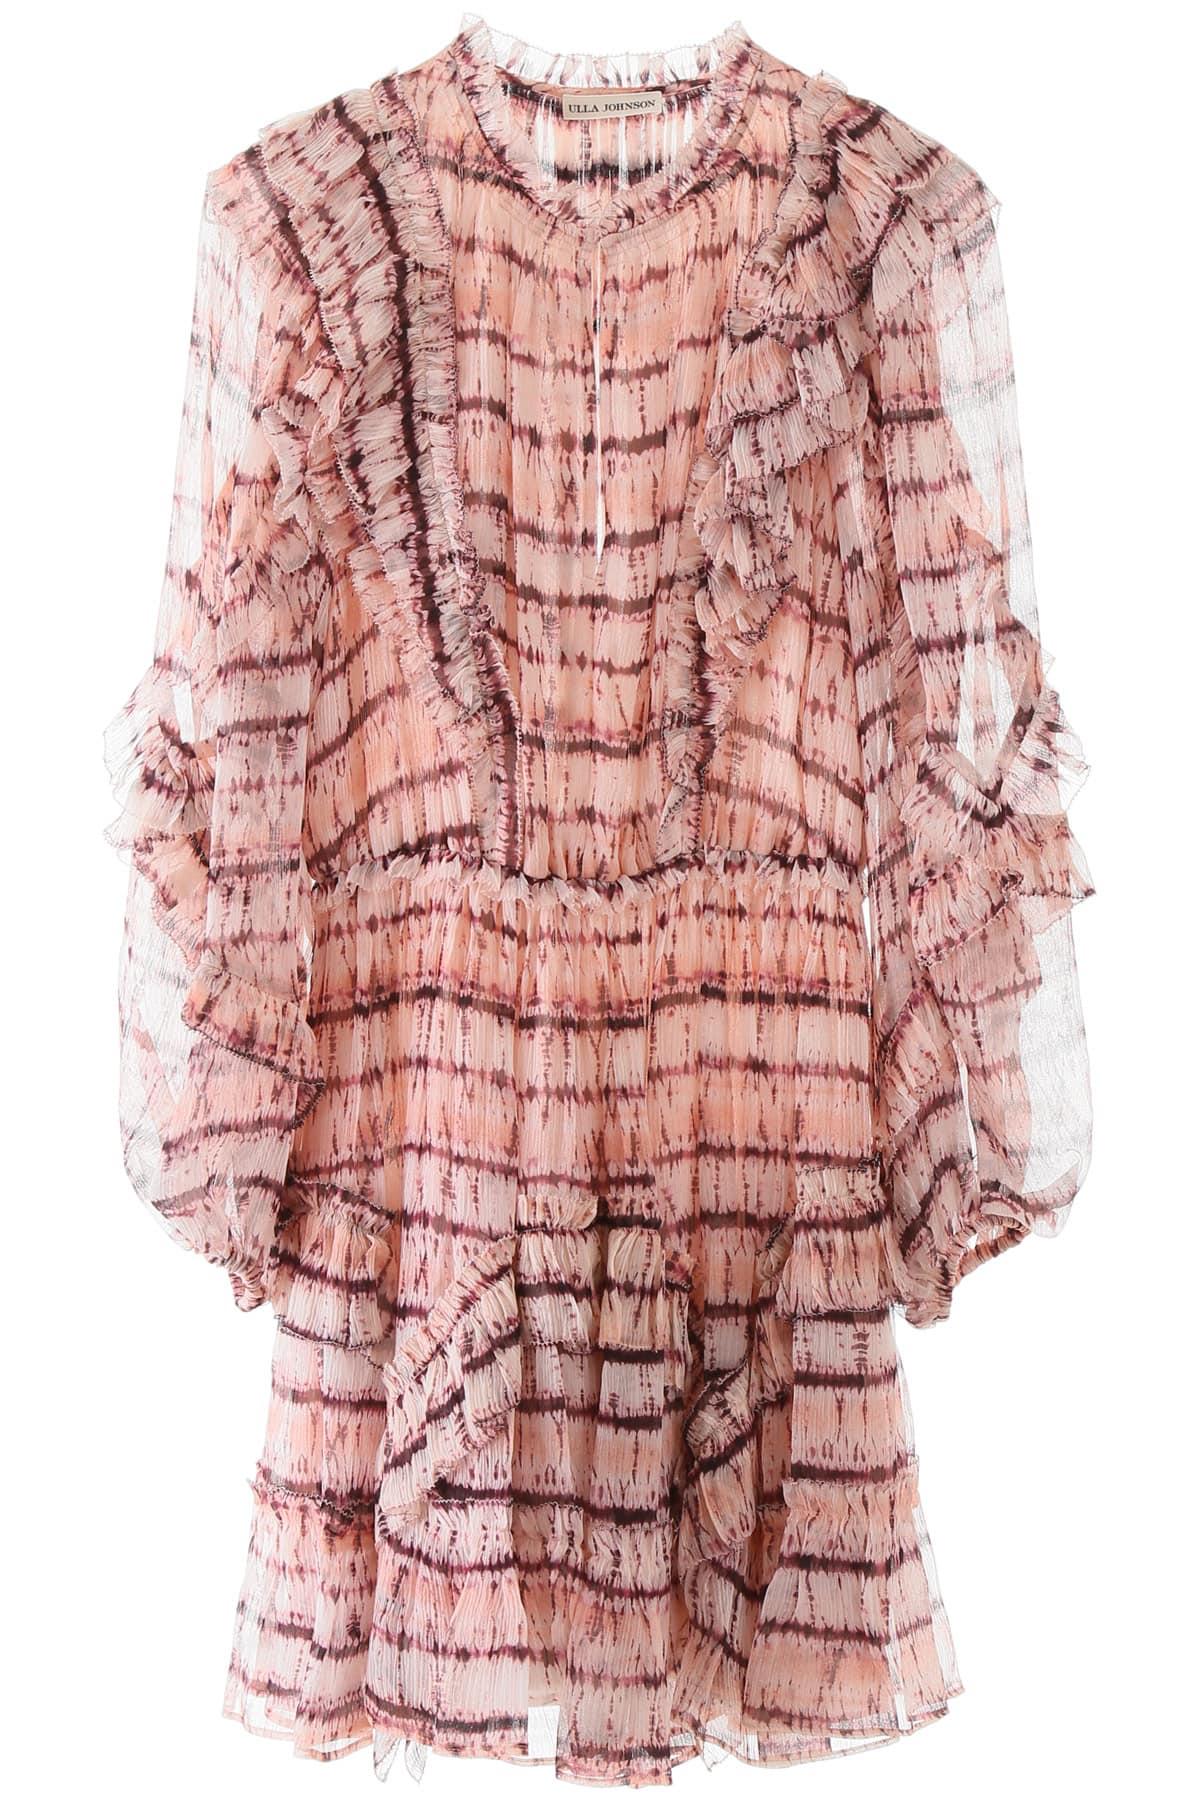 ULLA JOHNSON ABERDEEN TIE-DYE DRESS 4 Pink Silk